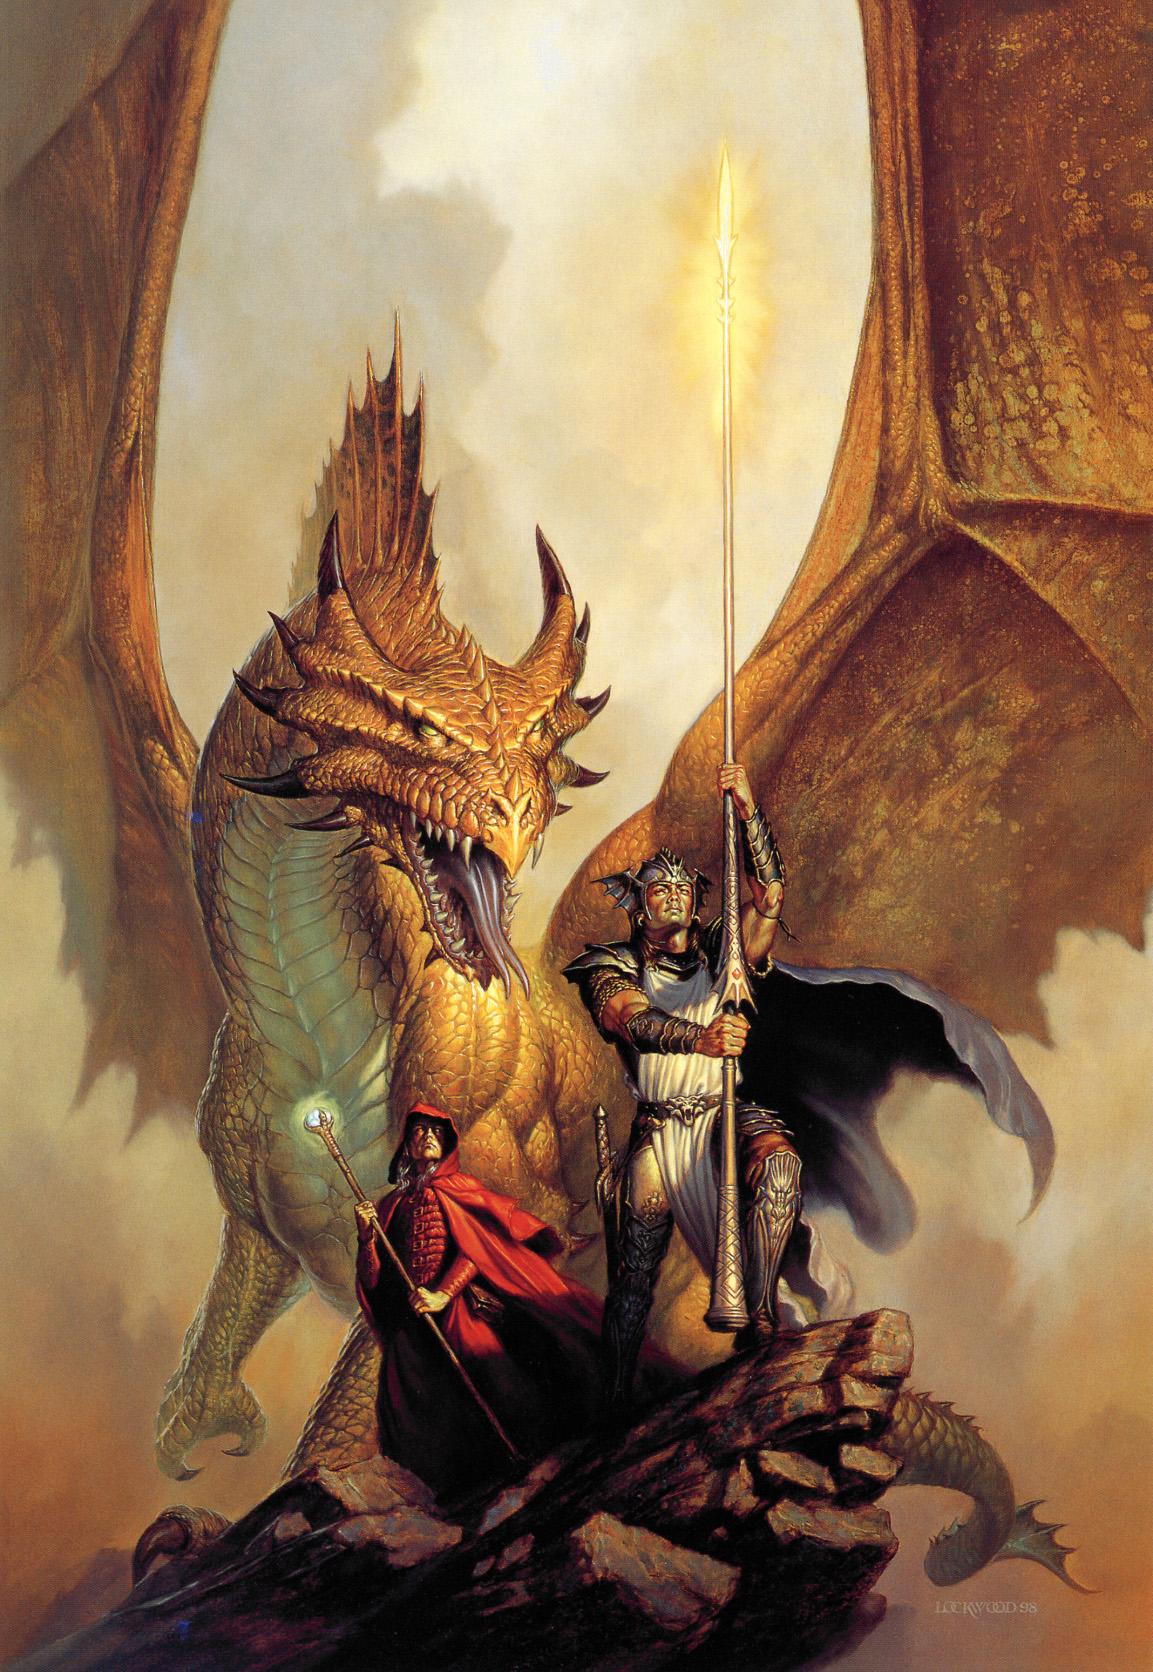 Dragonlance Wallpaper 1153x1672